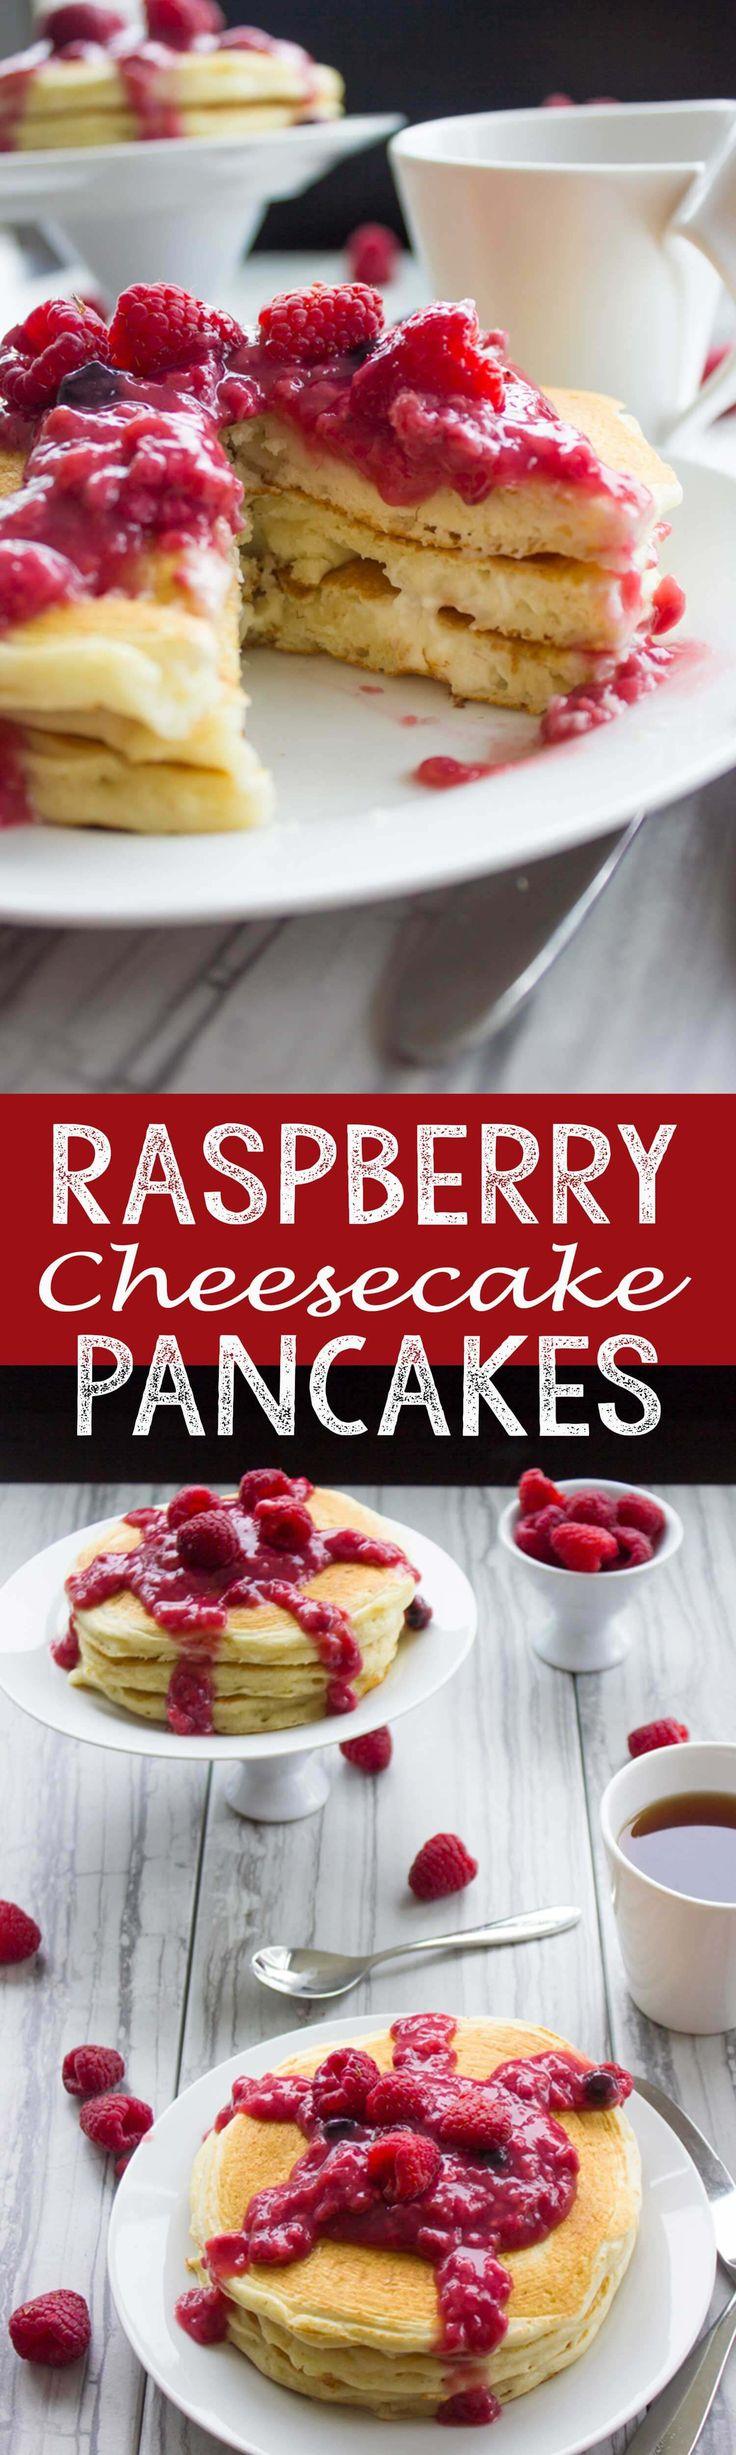 Raspberry Cheesecake Pancakes - Eazy Peazy Mealz